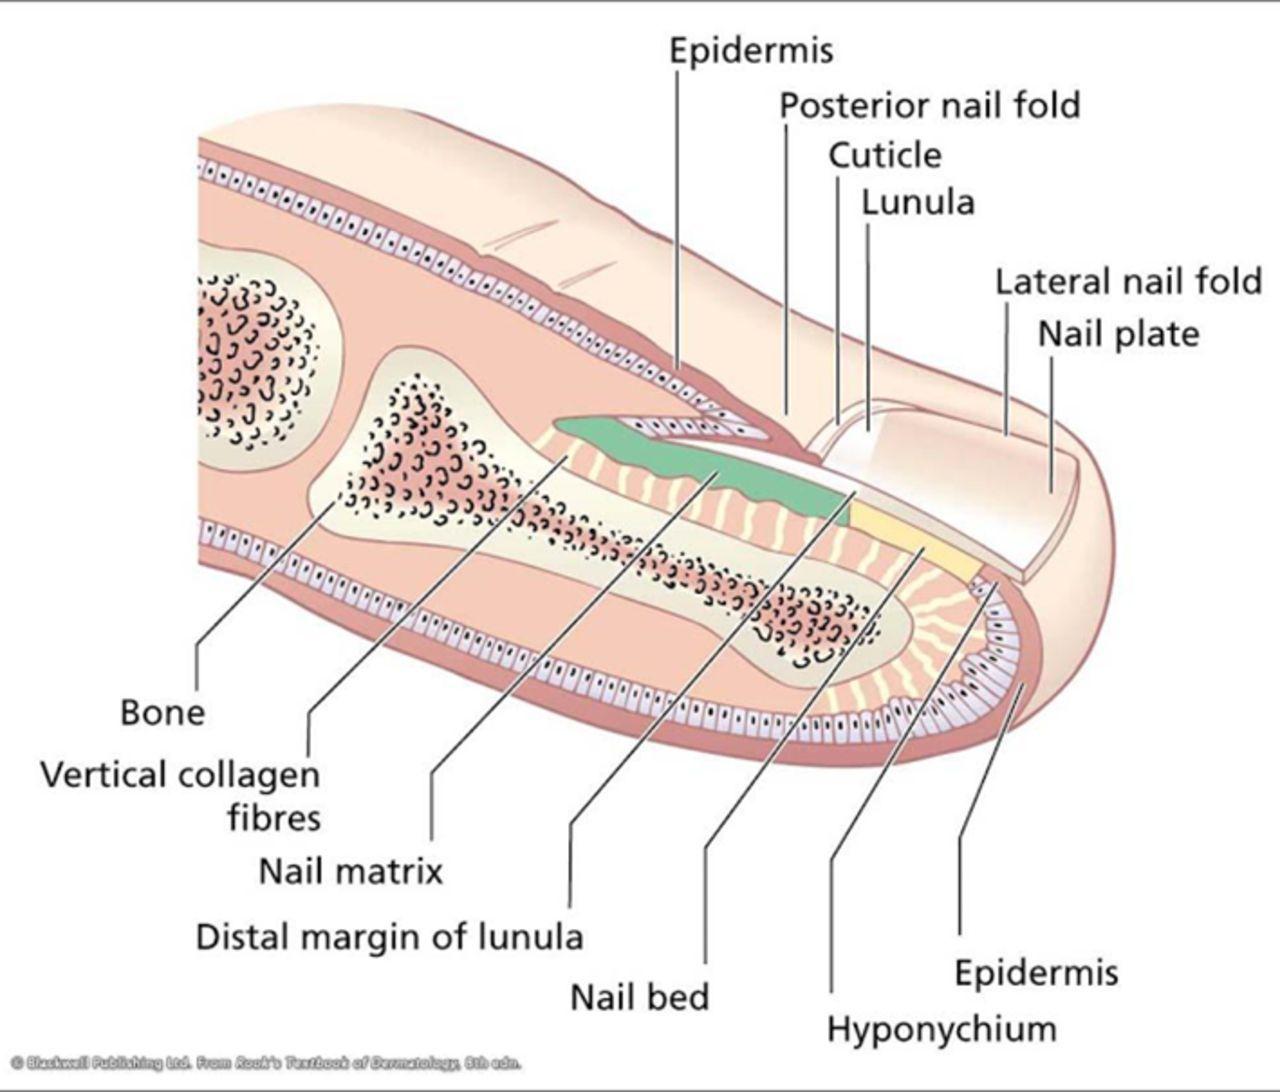 Pin By Aca Aca On Anatomy Pinterest Medicine